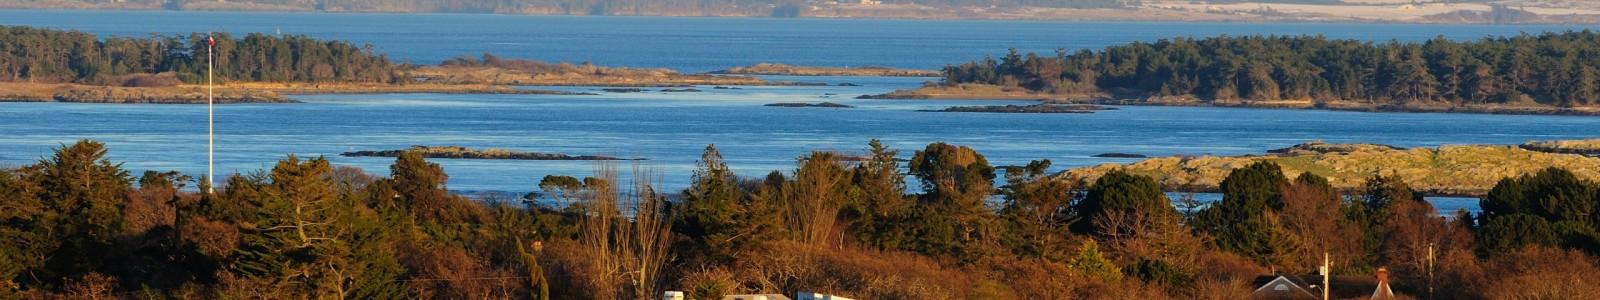 oak bay real estate vancouver island dfh